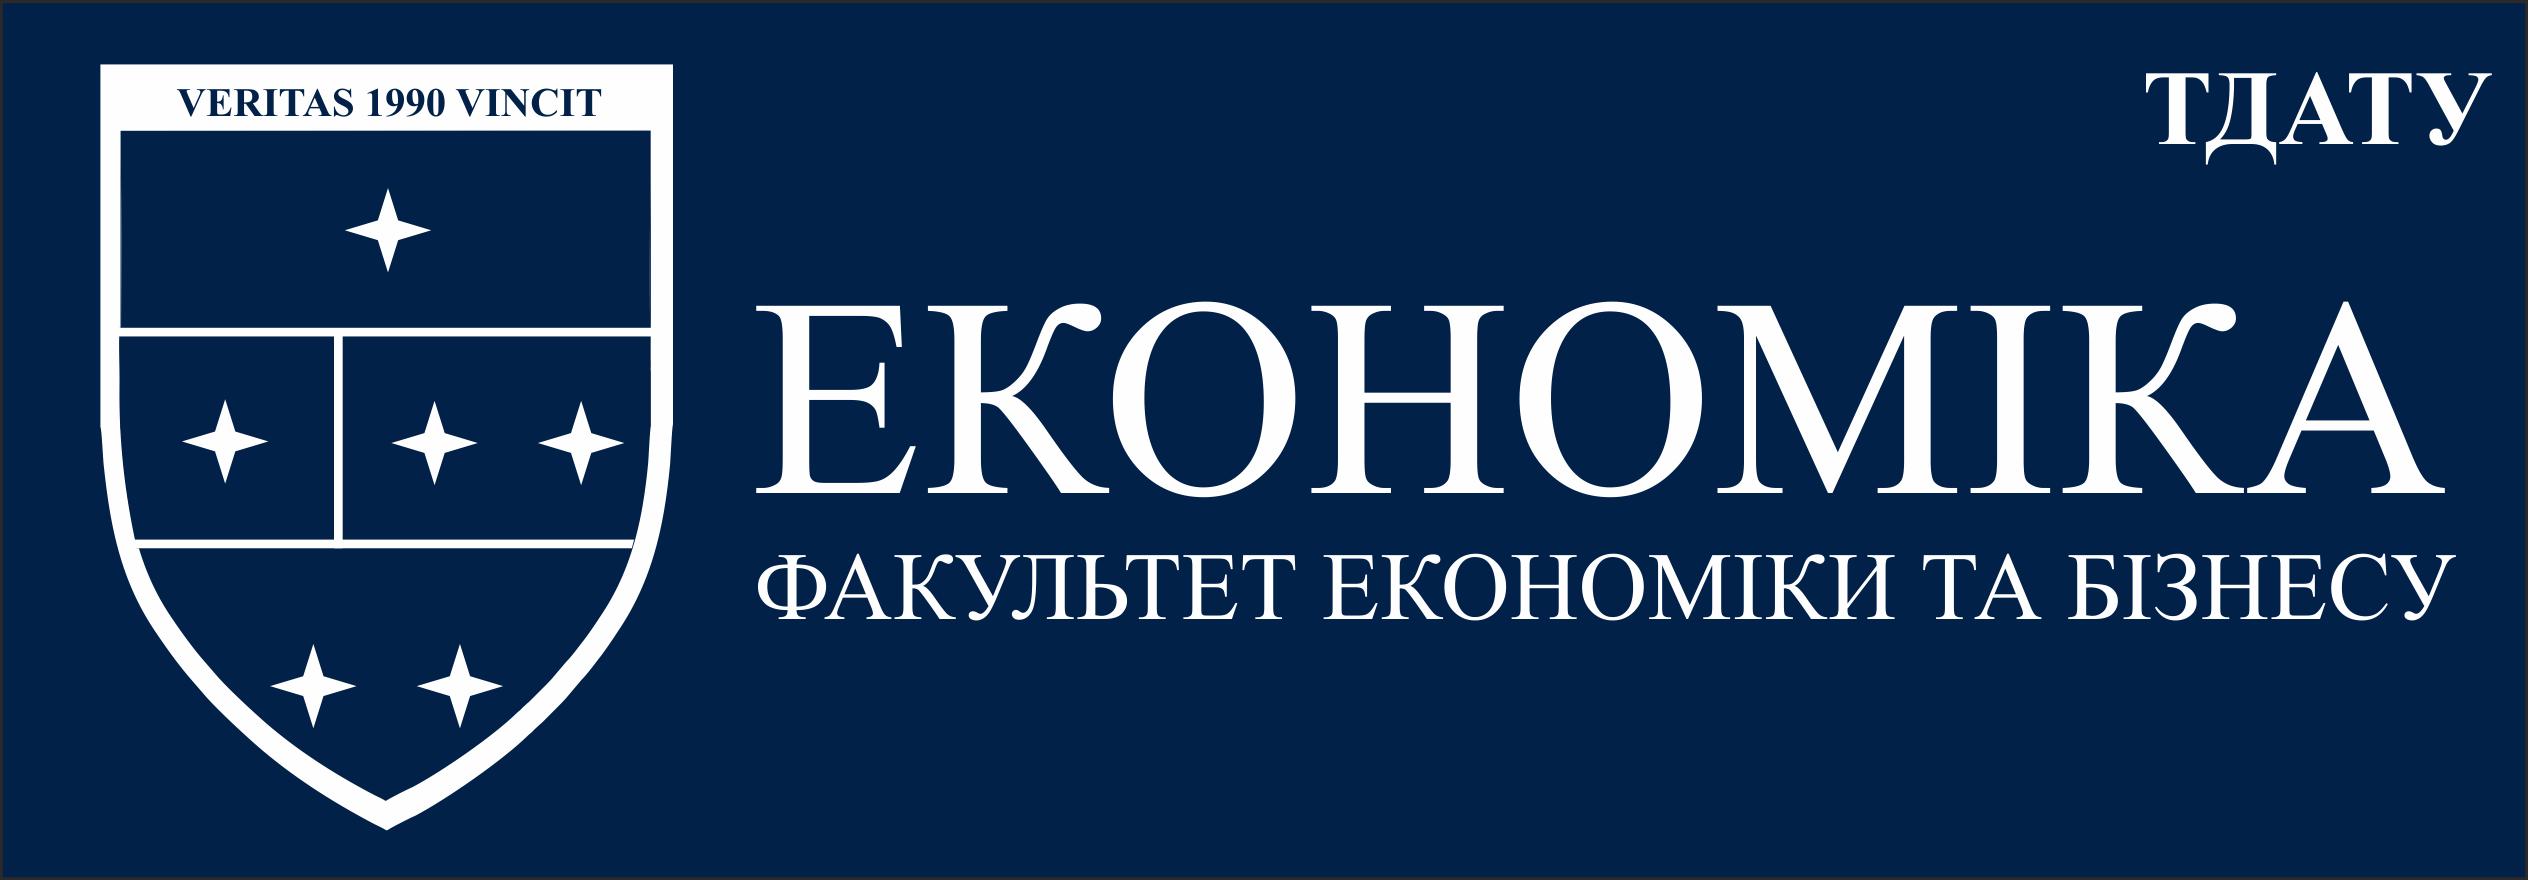 logo-feb25